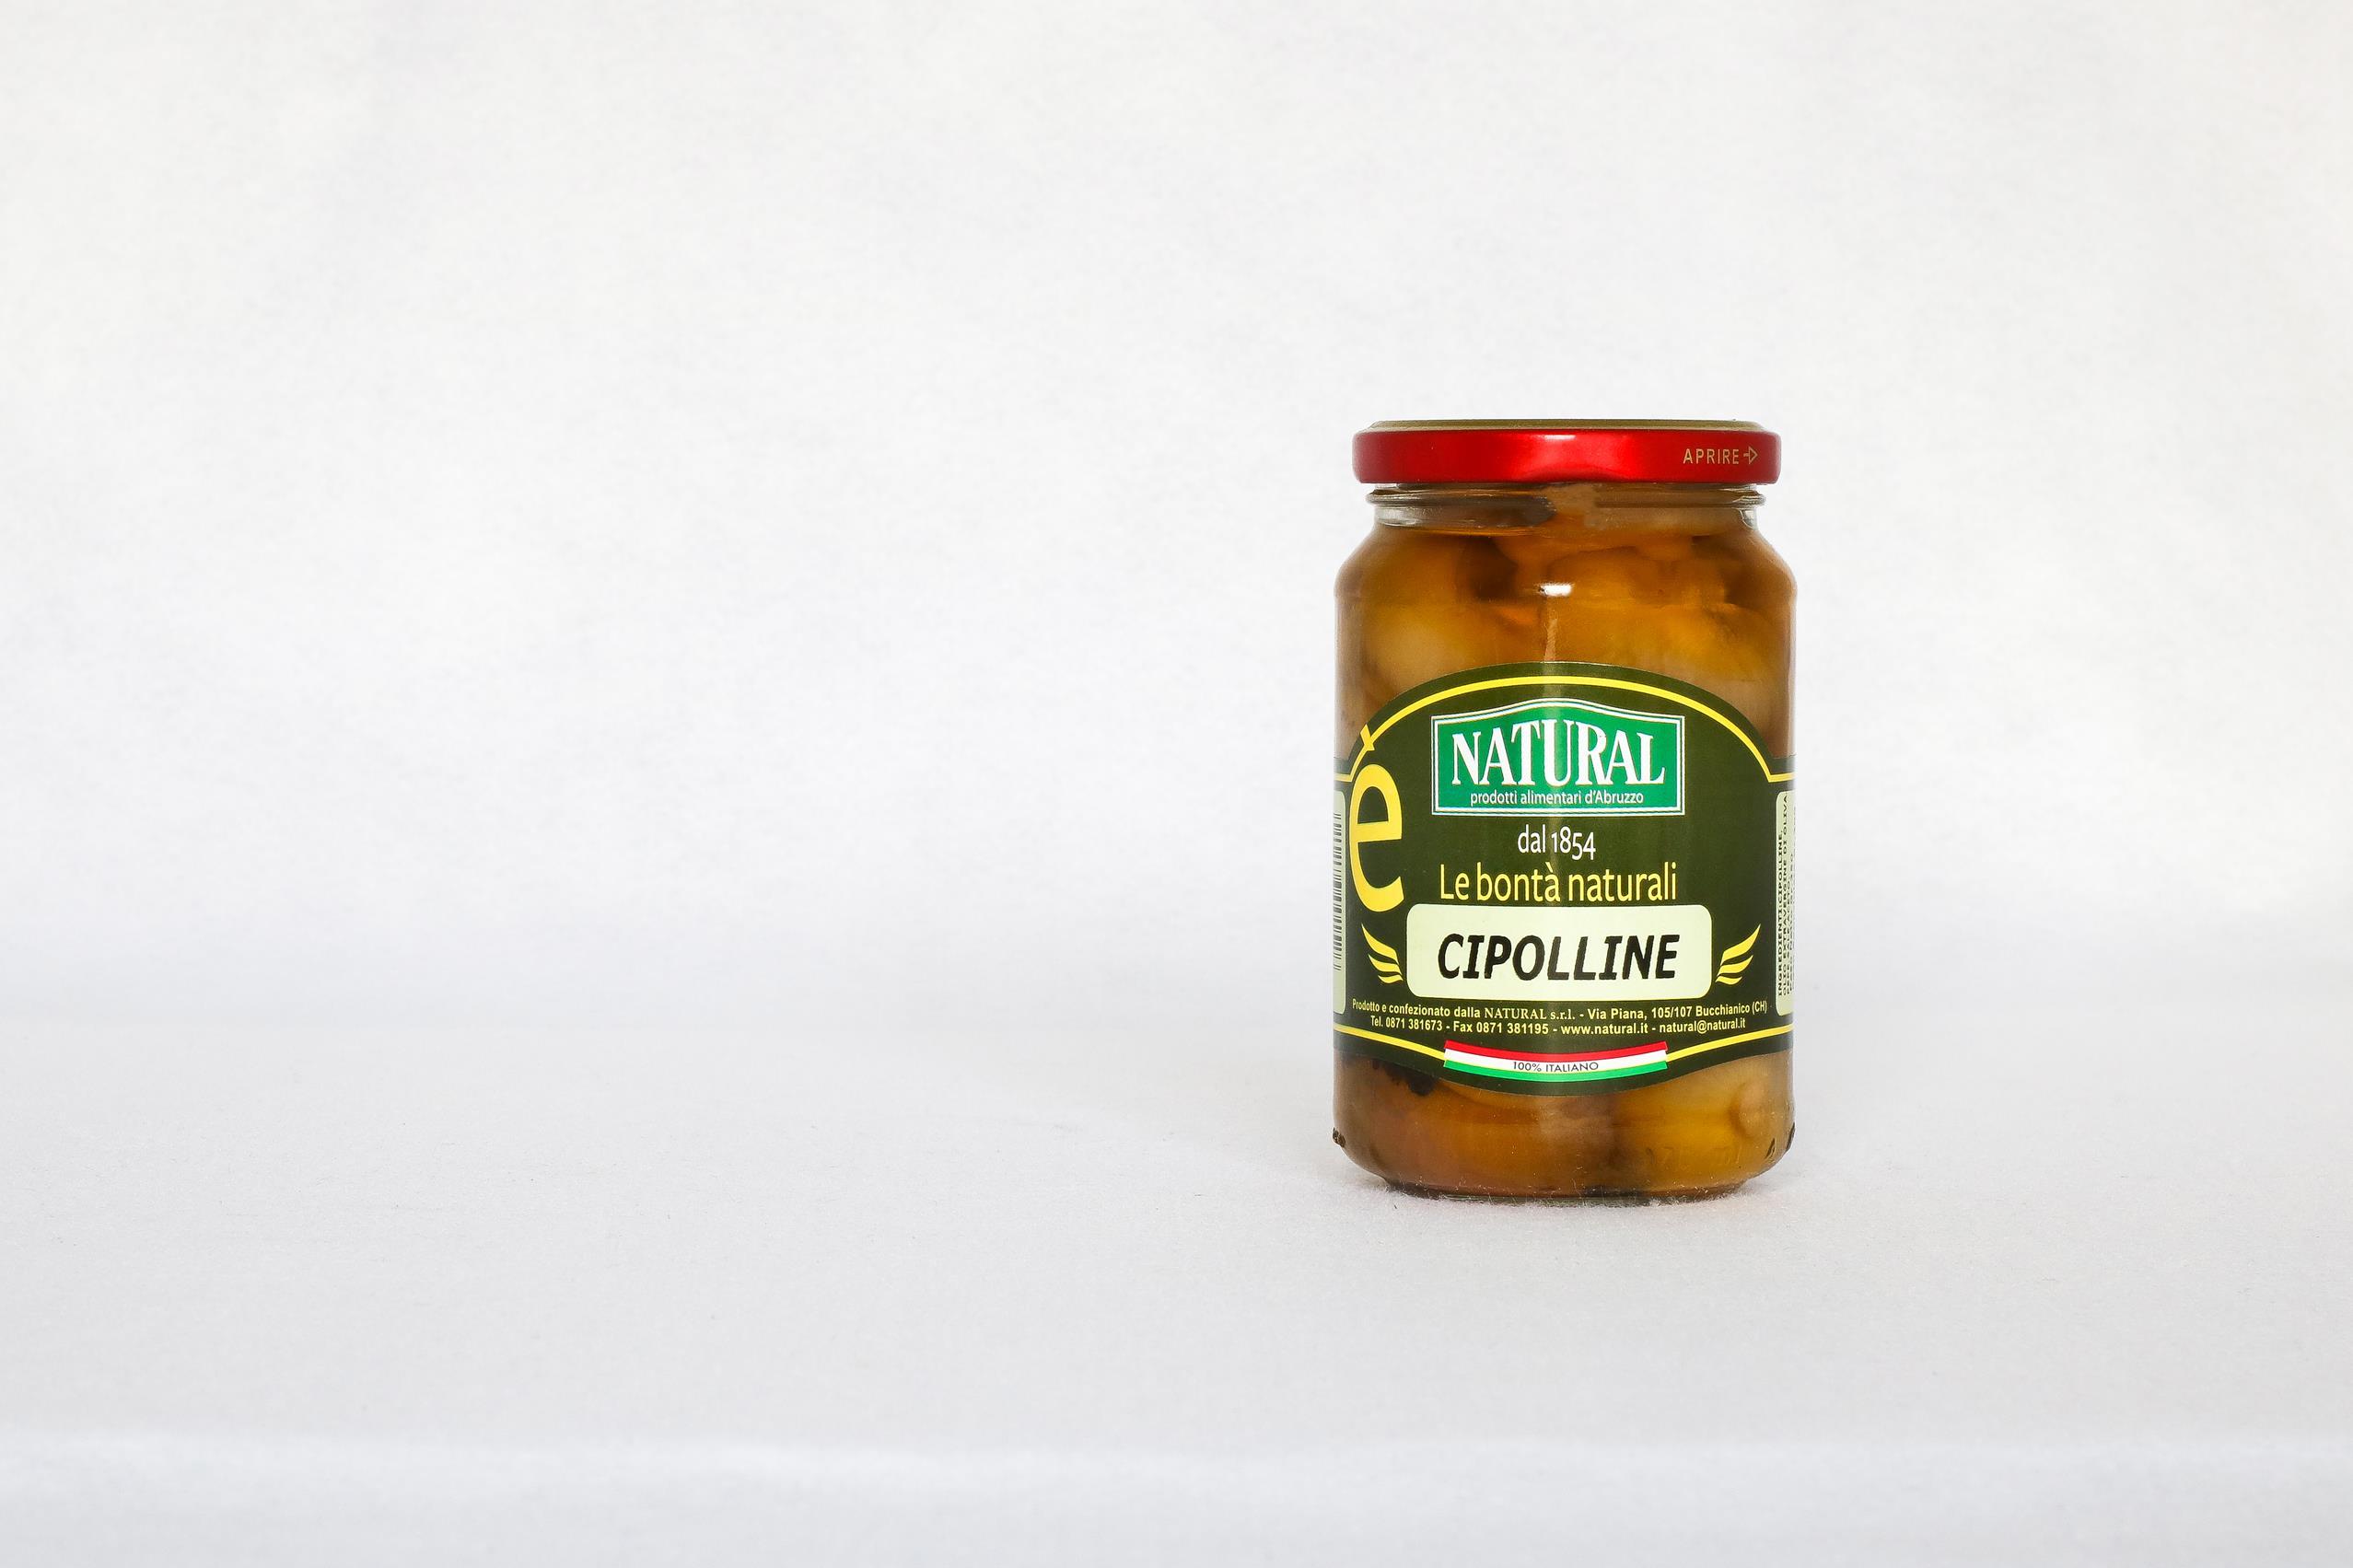 Natural Cipolline Sottolio